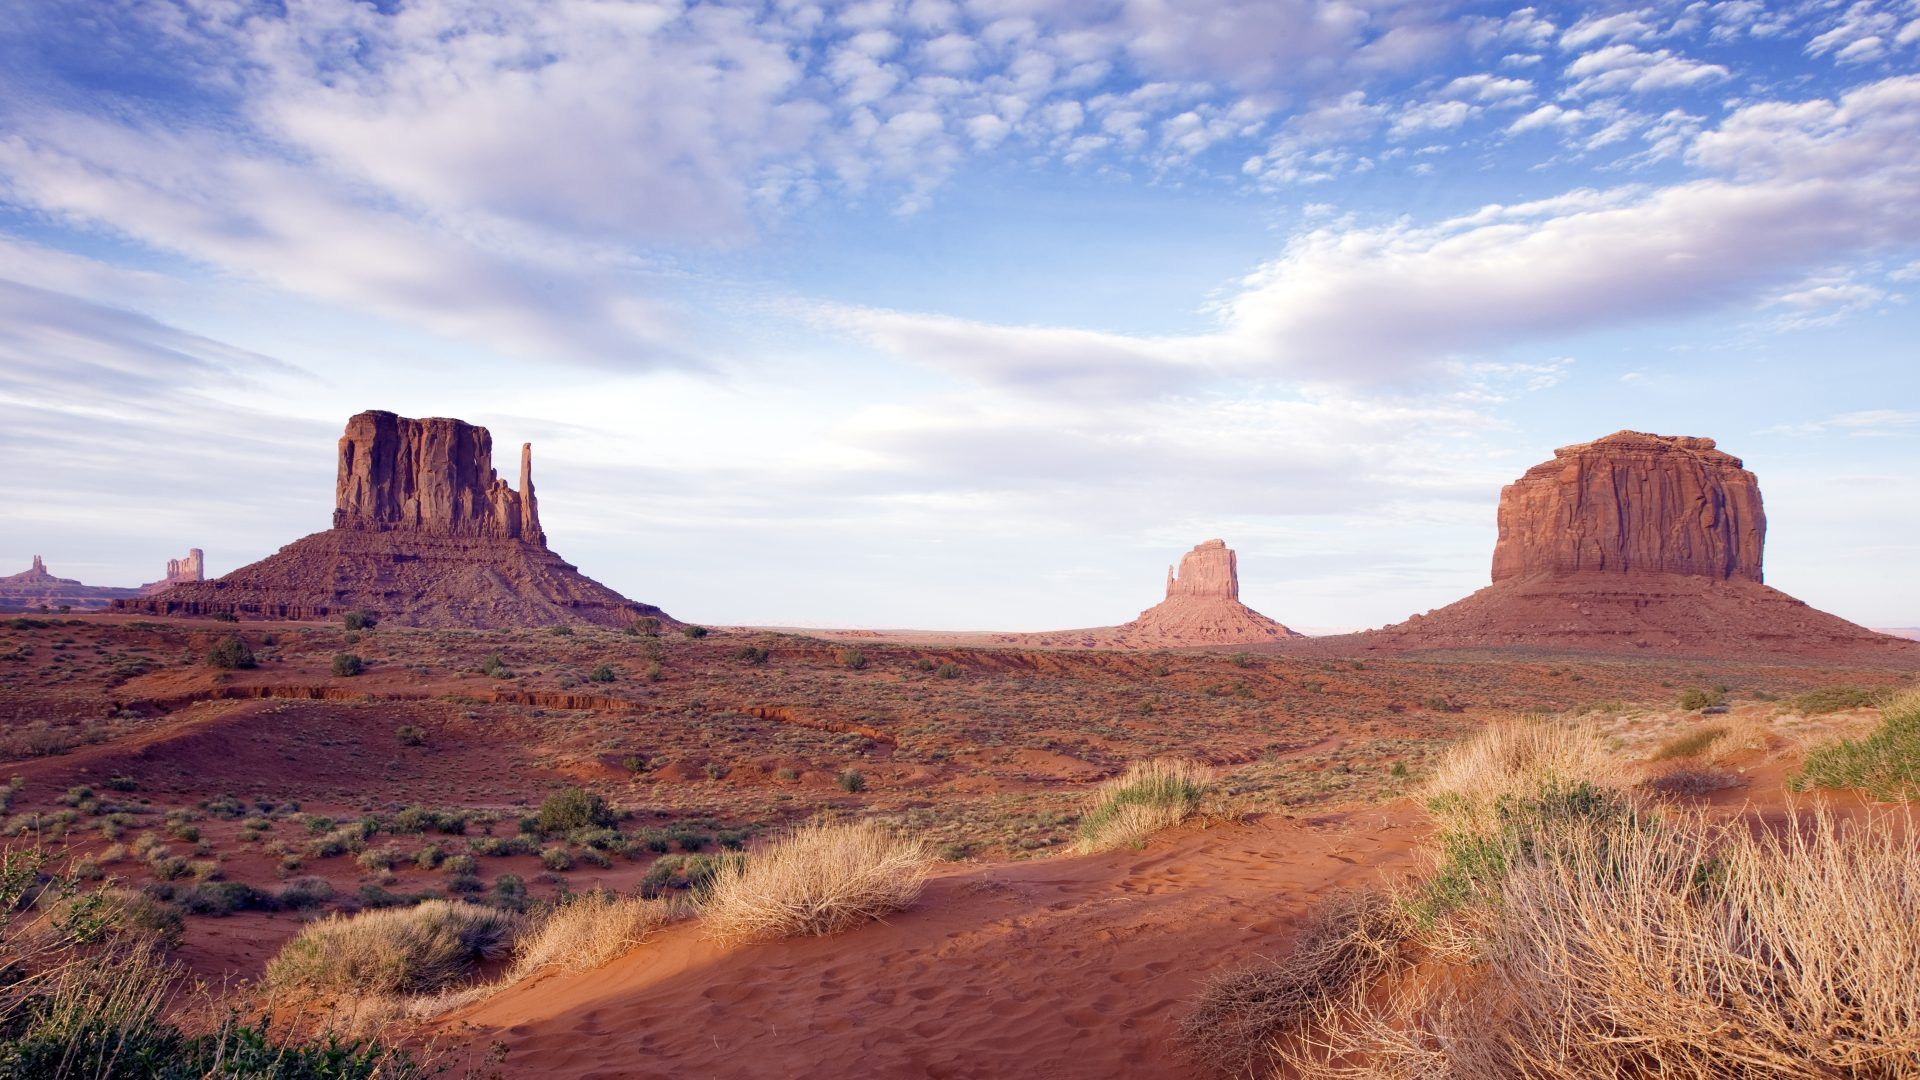 Southwest 1080p Wallpaper